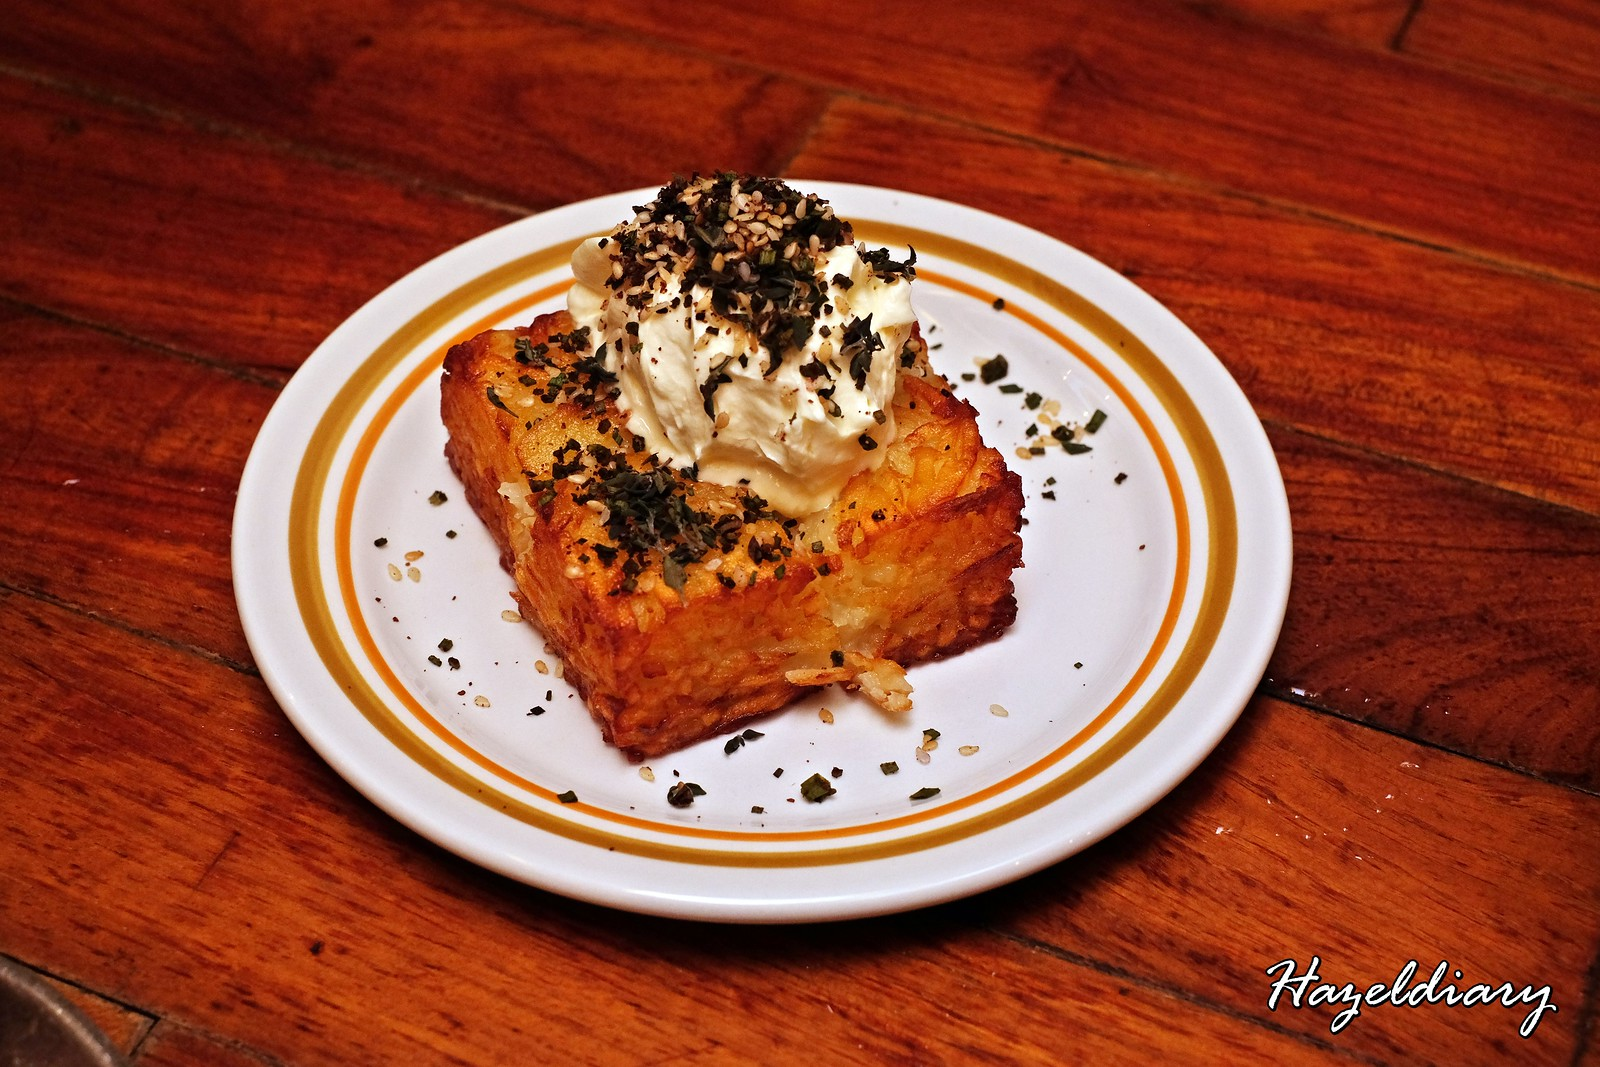 Artichoke by Chef Bjorn Shen-Hashbrowns